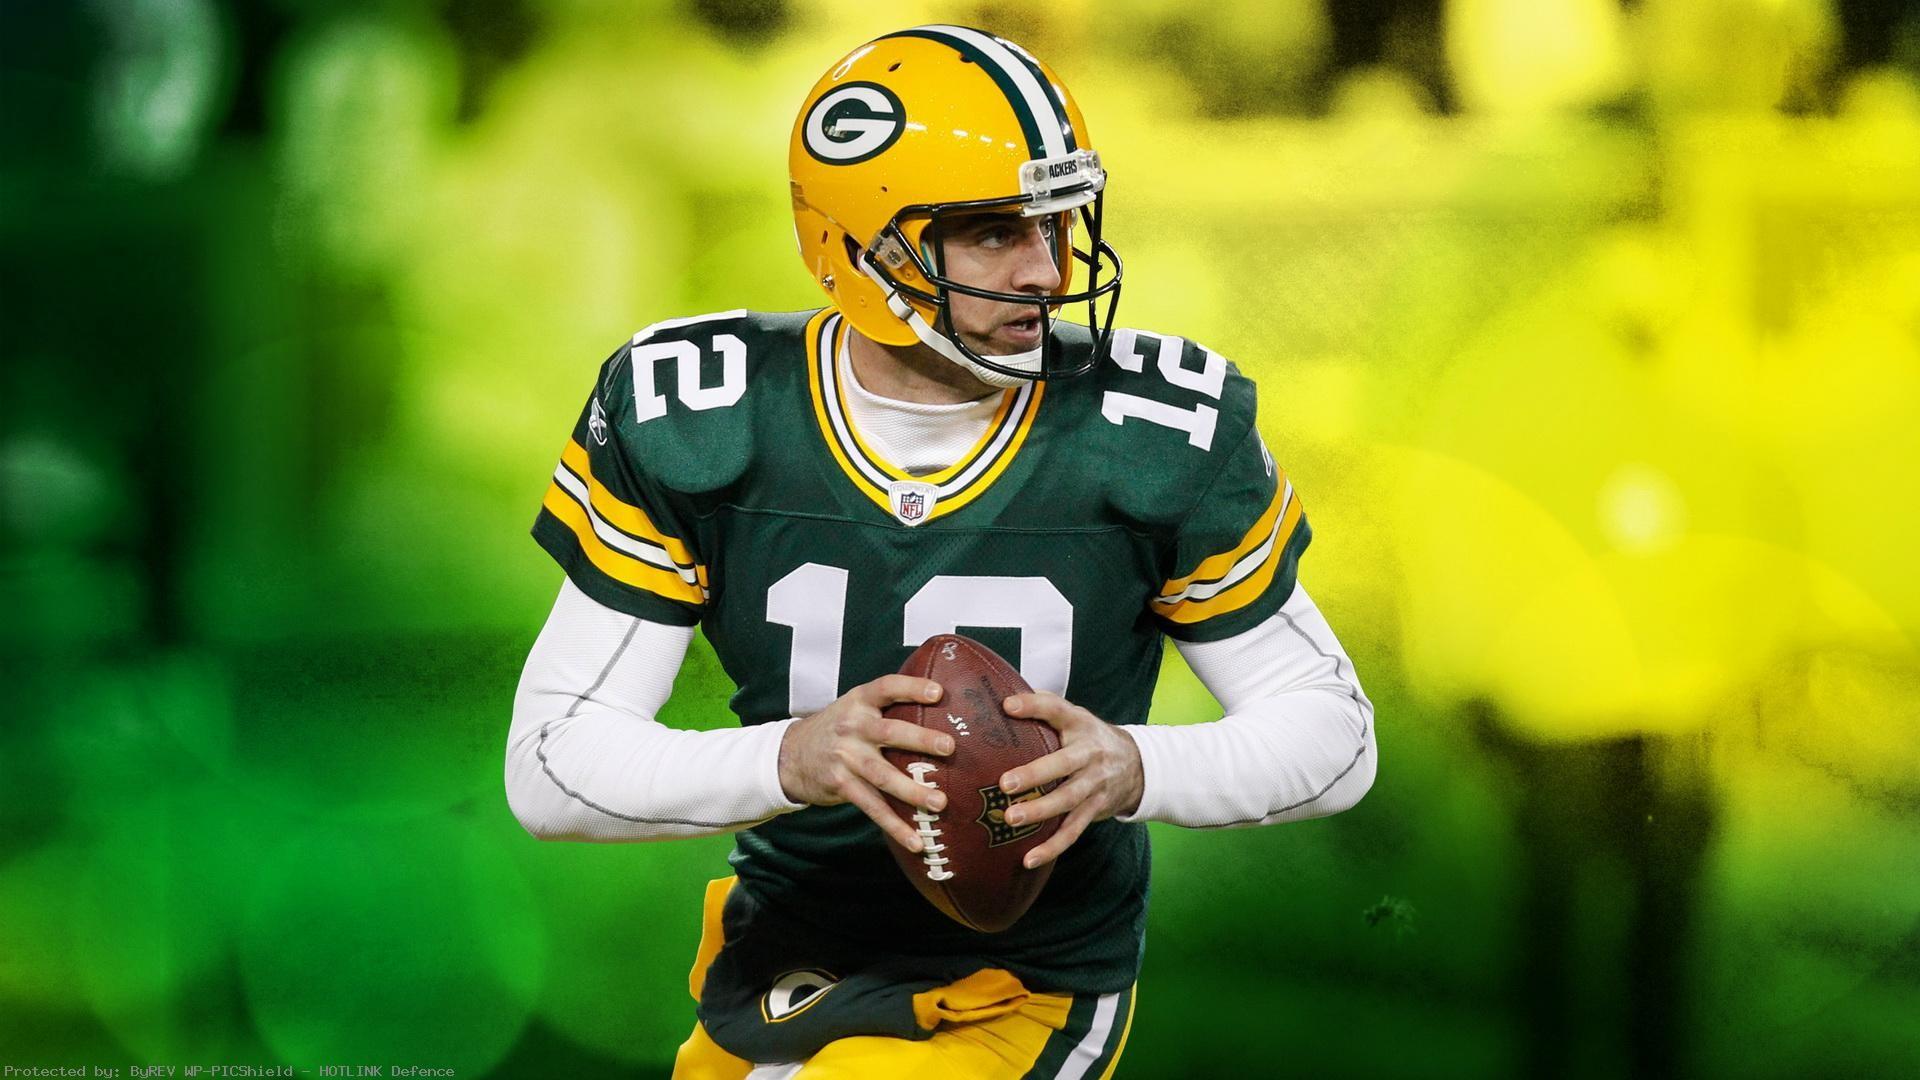 Cool-NFL-Football-wallpaper-wp4403691